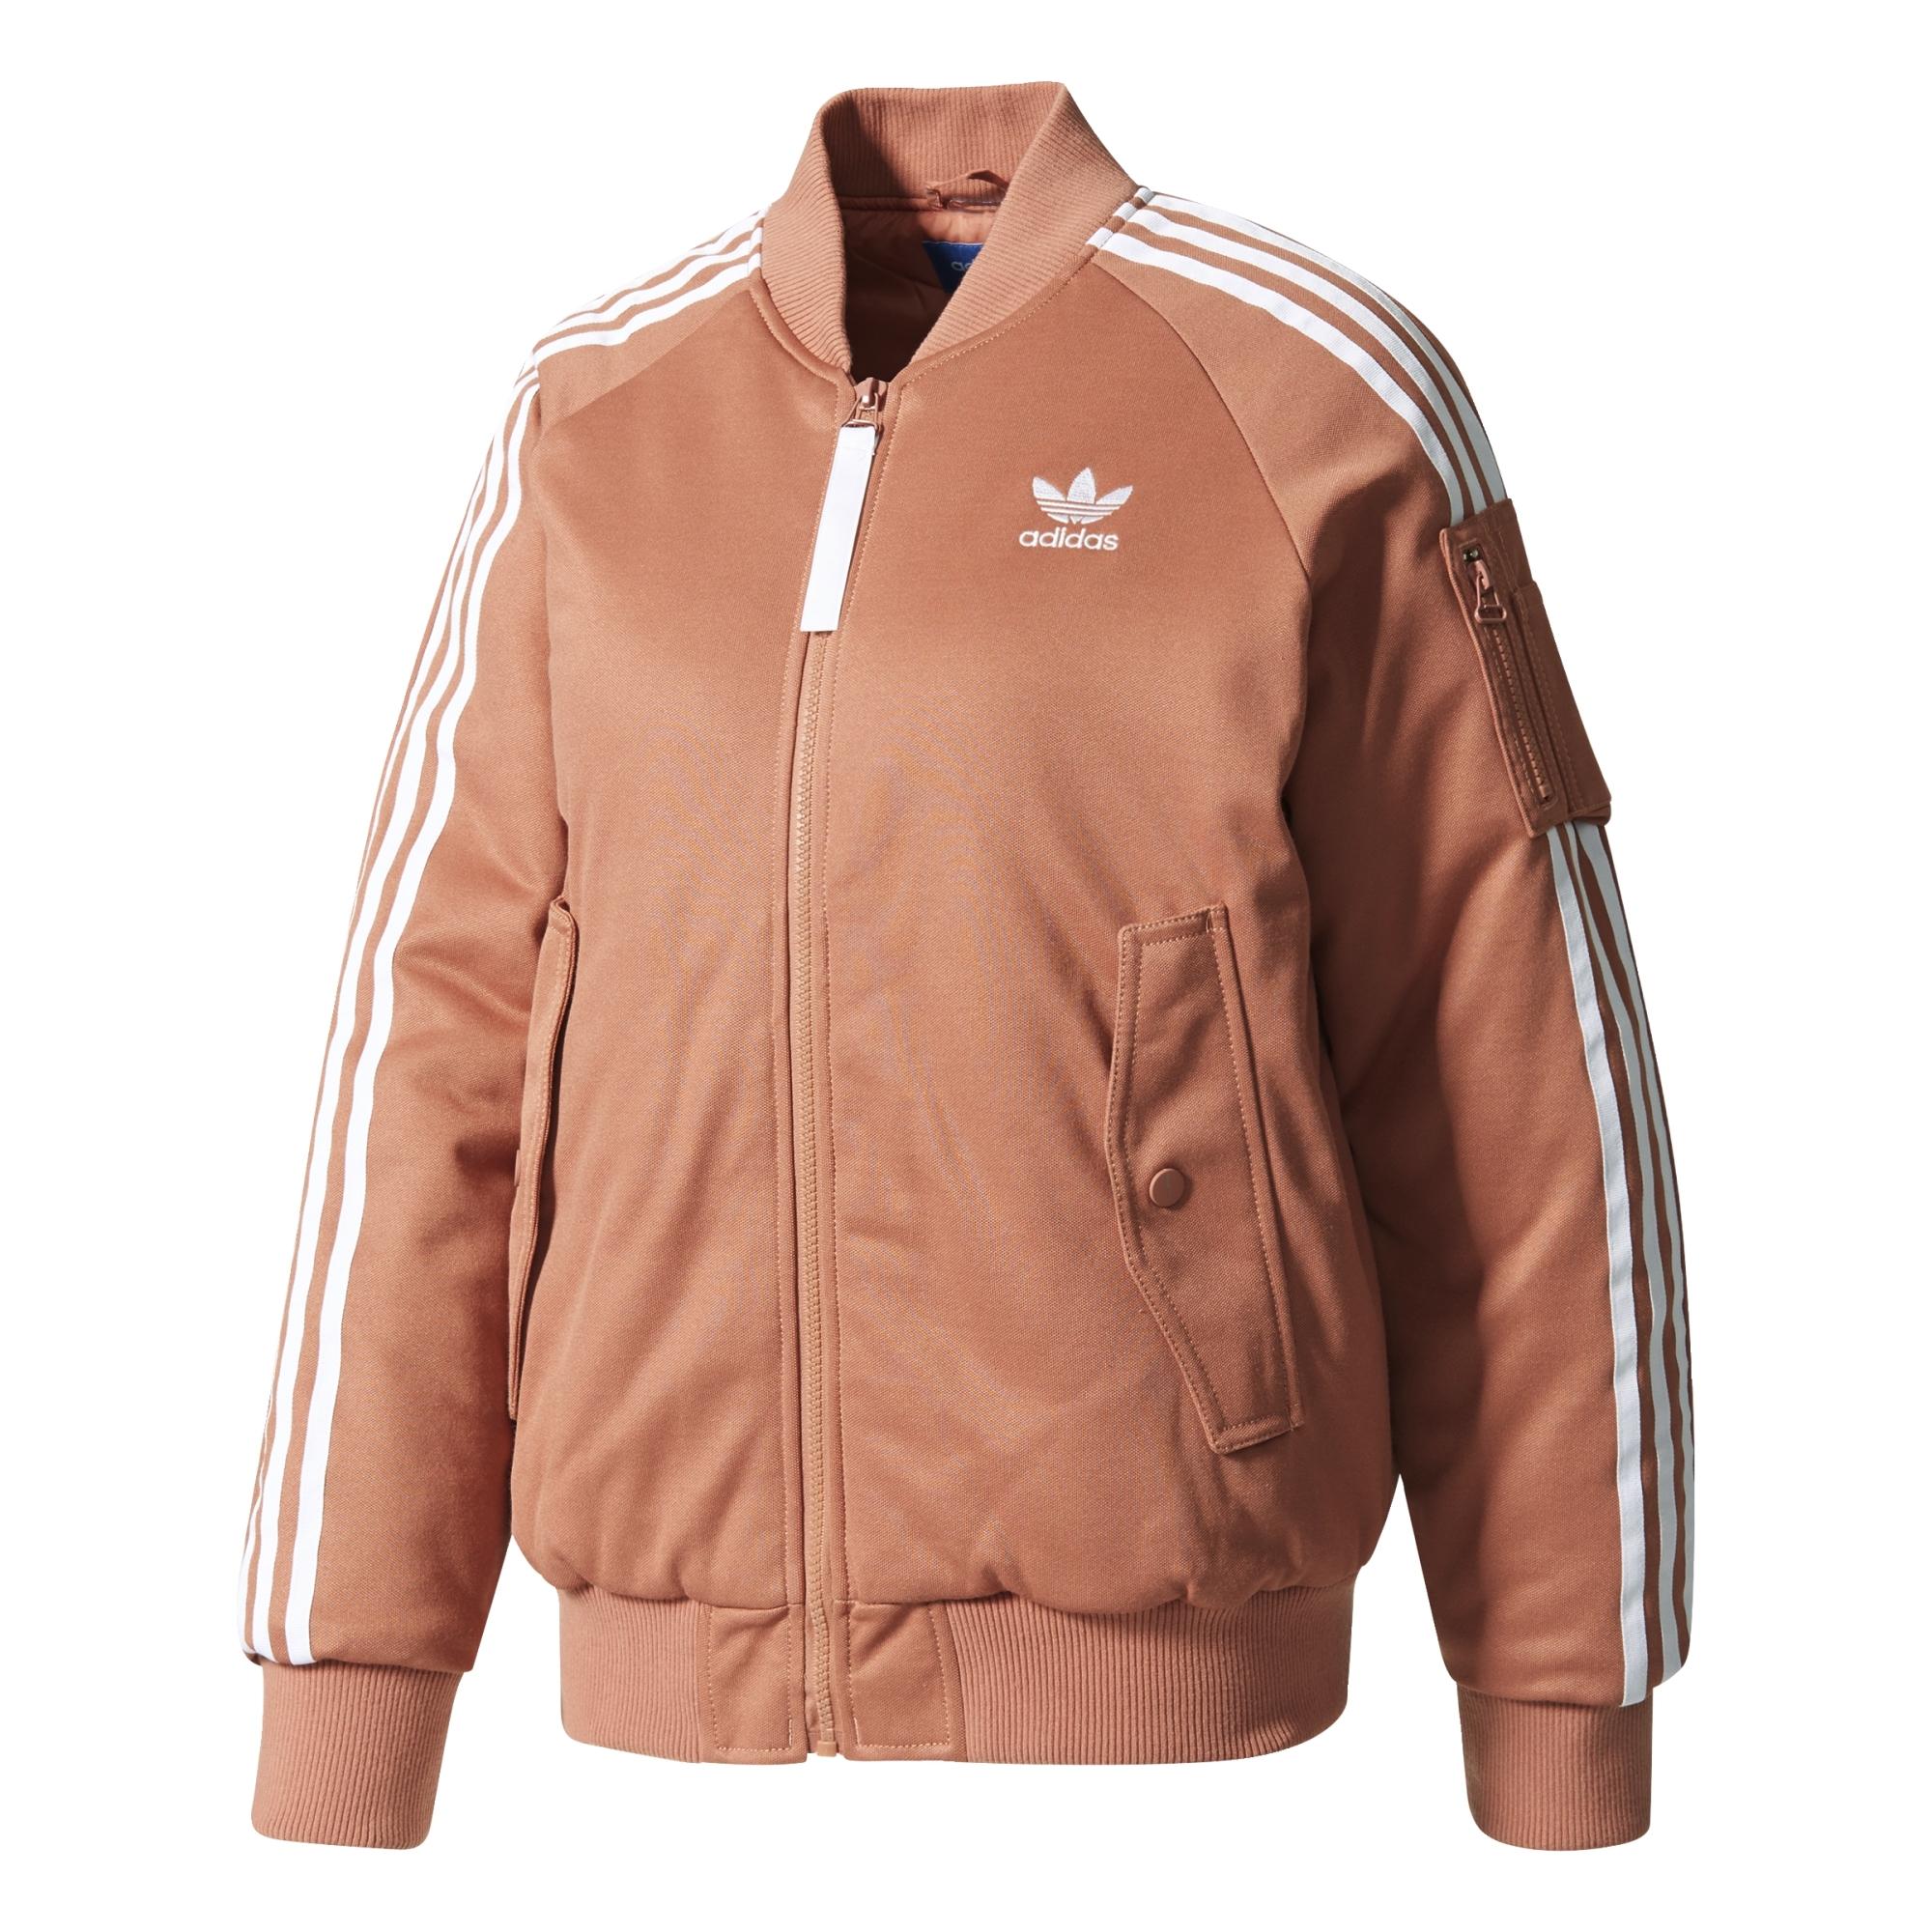 Adidas Originals Jacket Short Bomber BB - manelsanchez pt